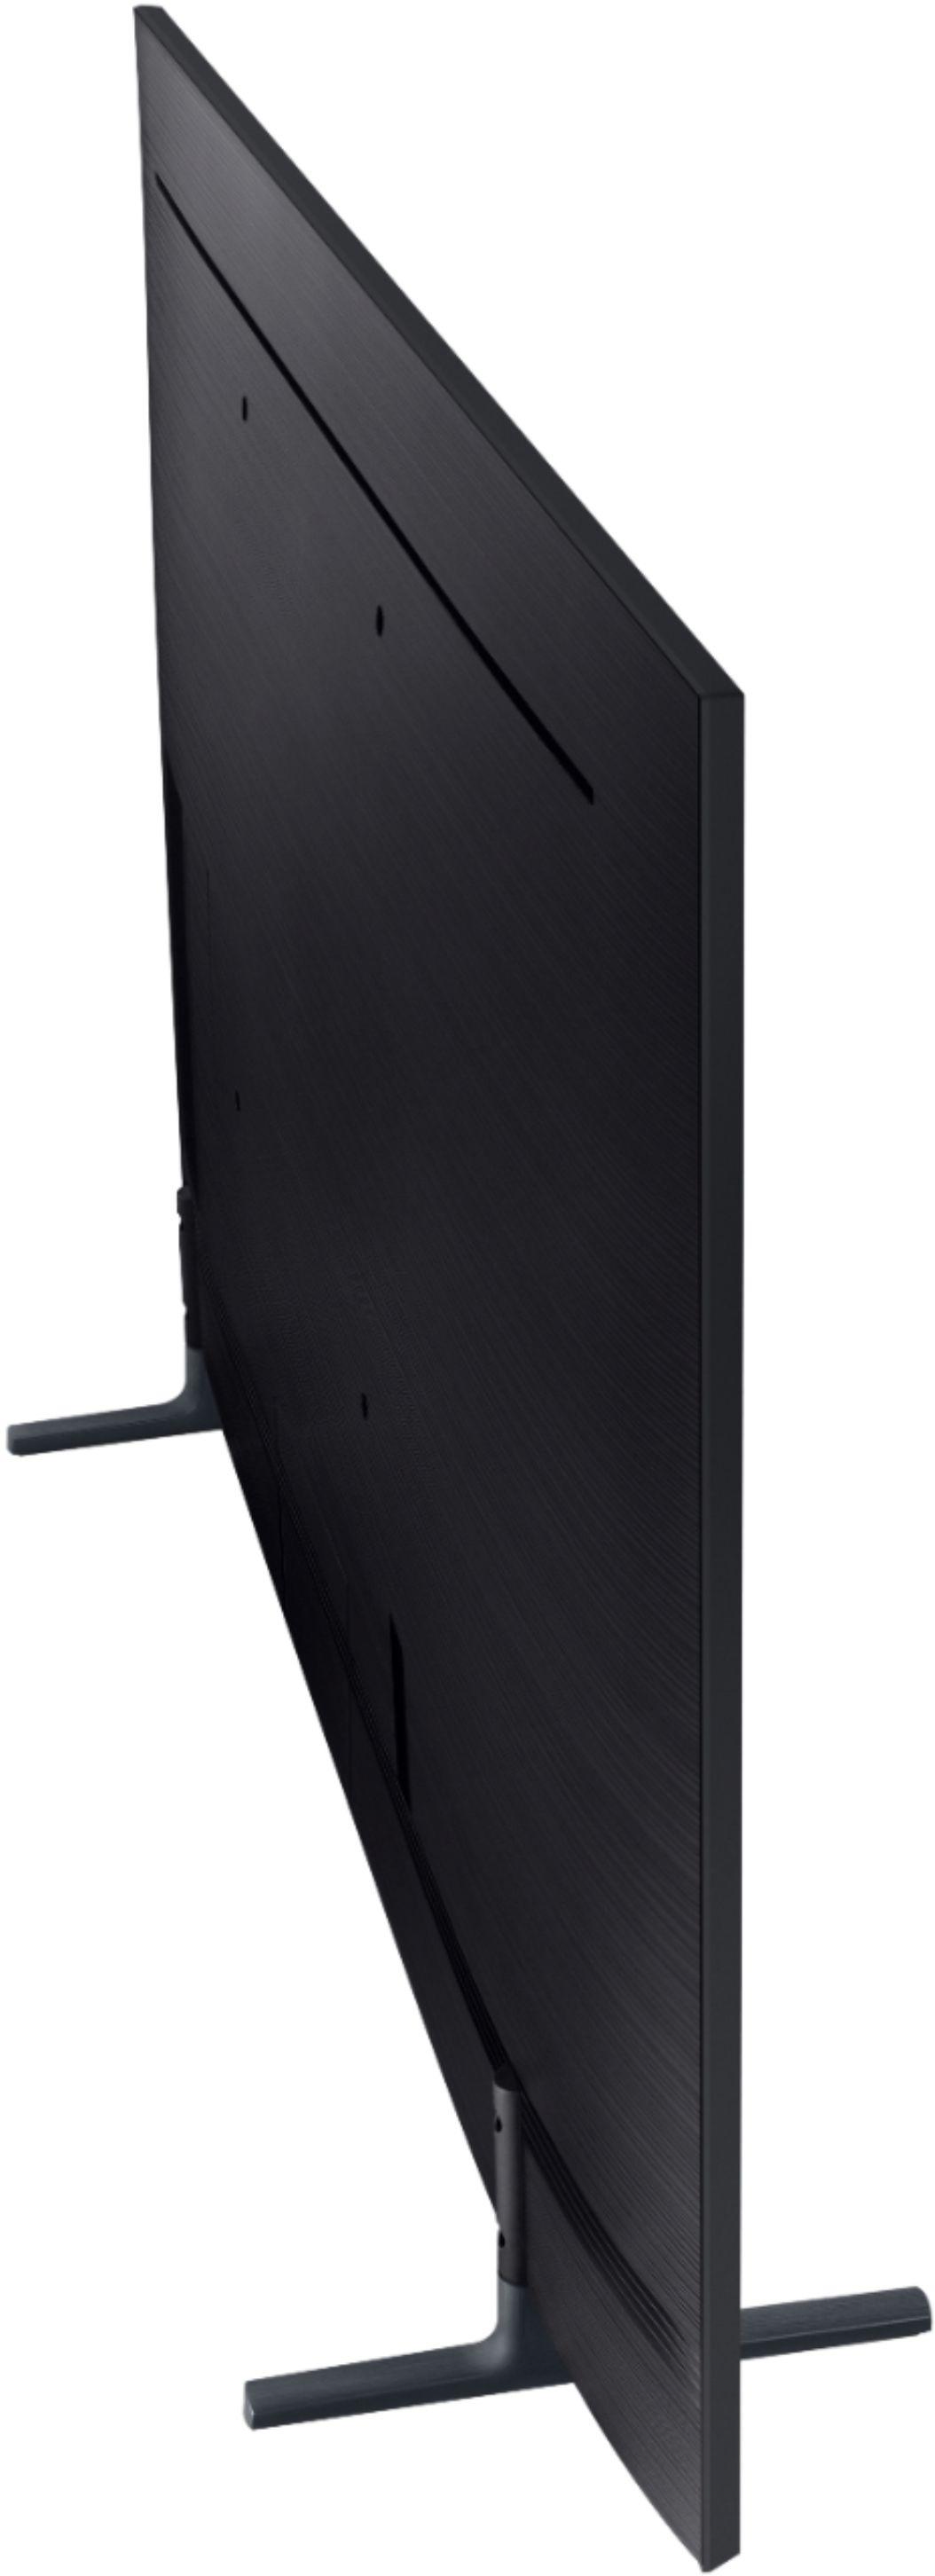 Image 4 for Samsung UN75RU8000FXZA